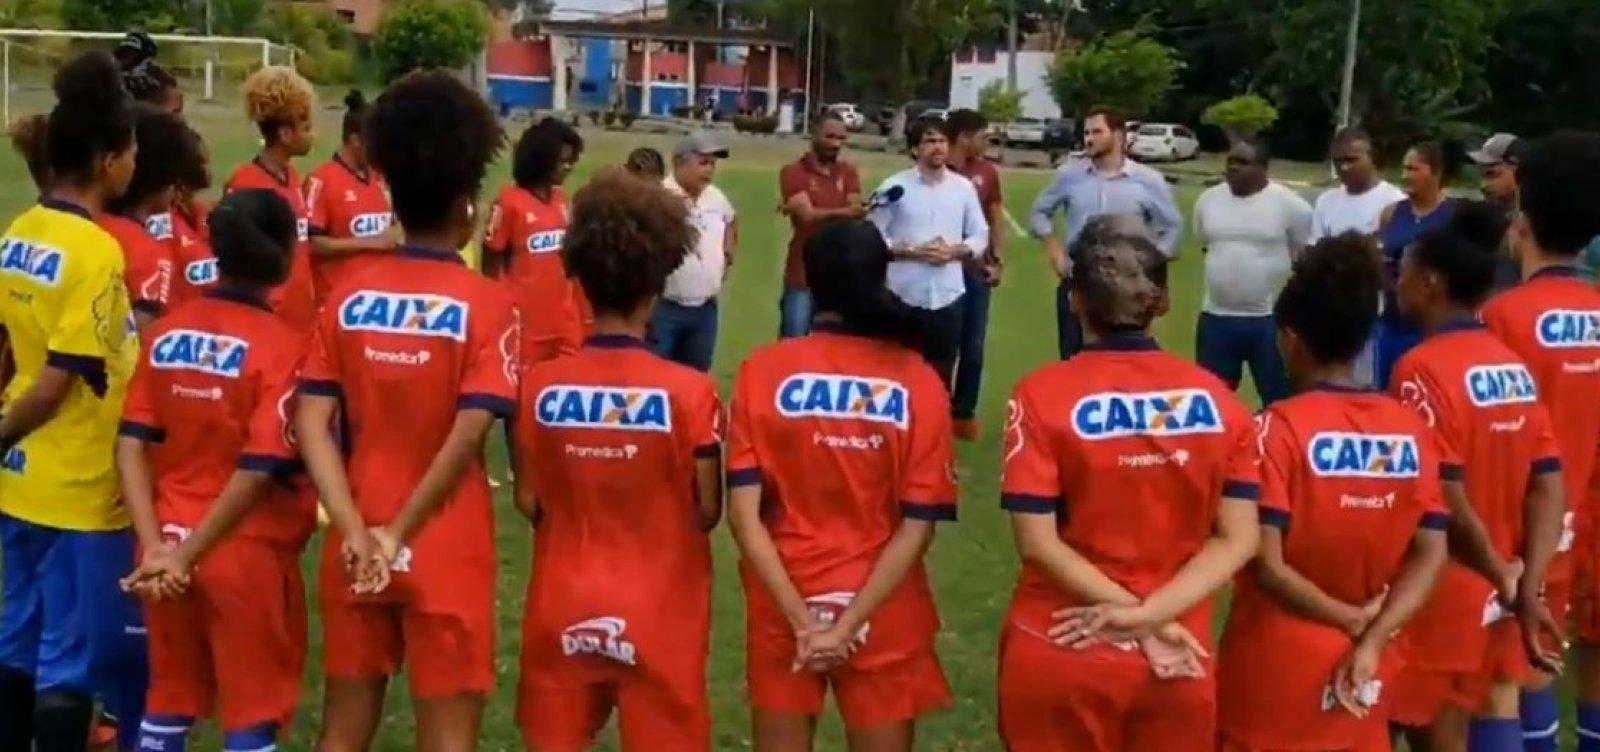 Bahia prepara anúncio de equipe feminina de futebol